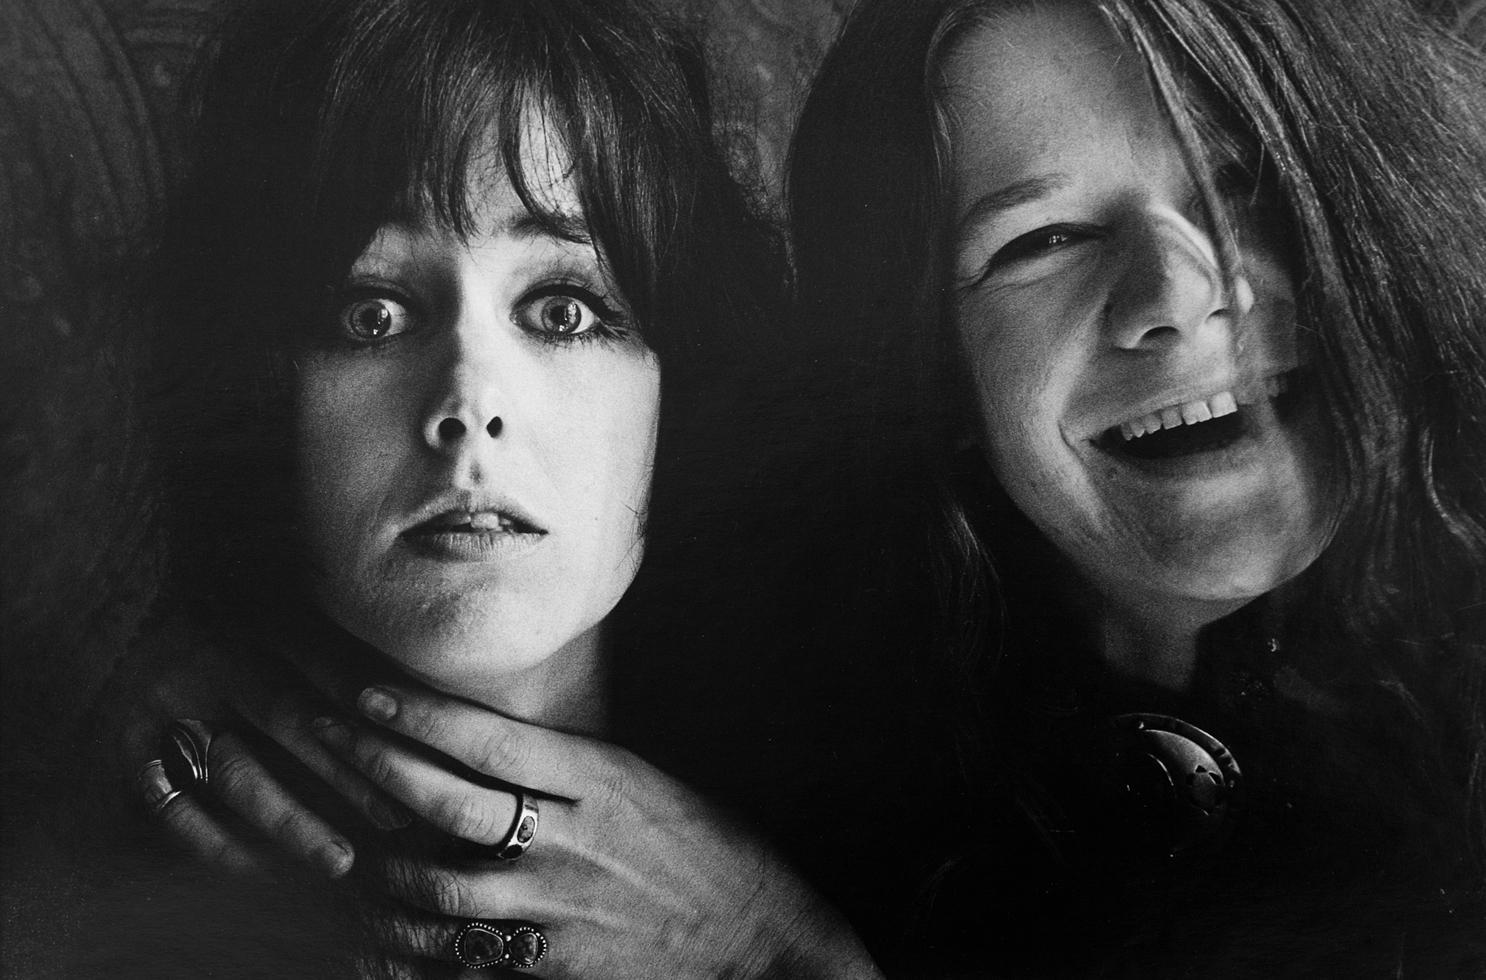 Grace Slick and Janis Joplin, San Francisco, CA 1967 | Orphaned Images